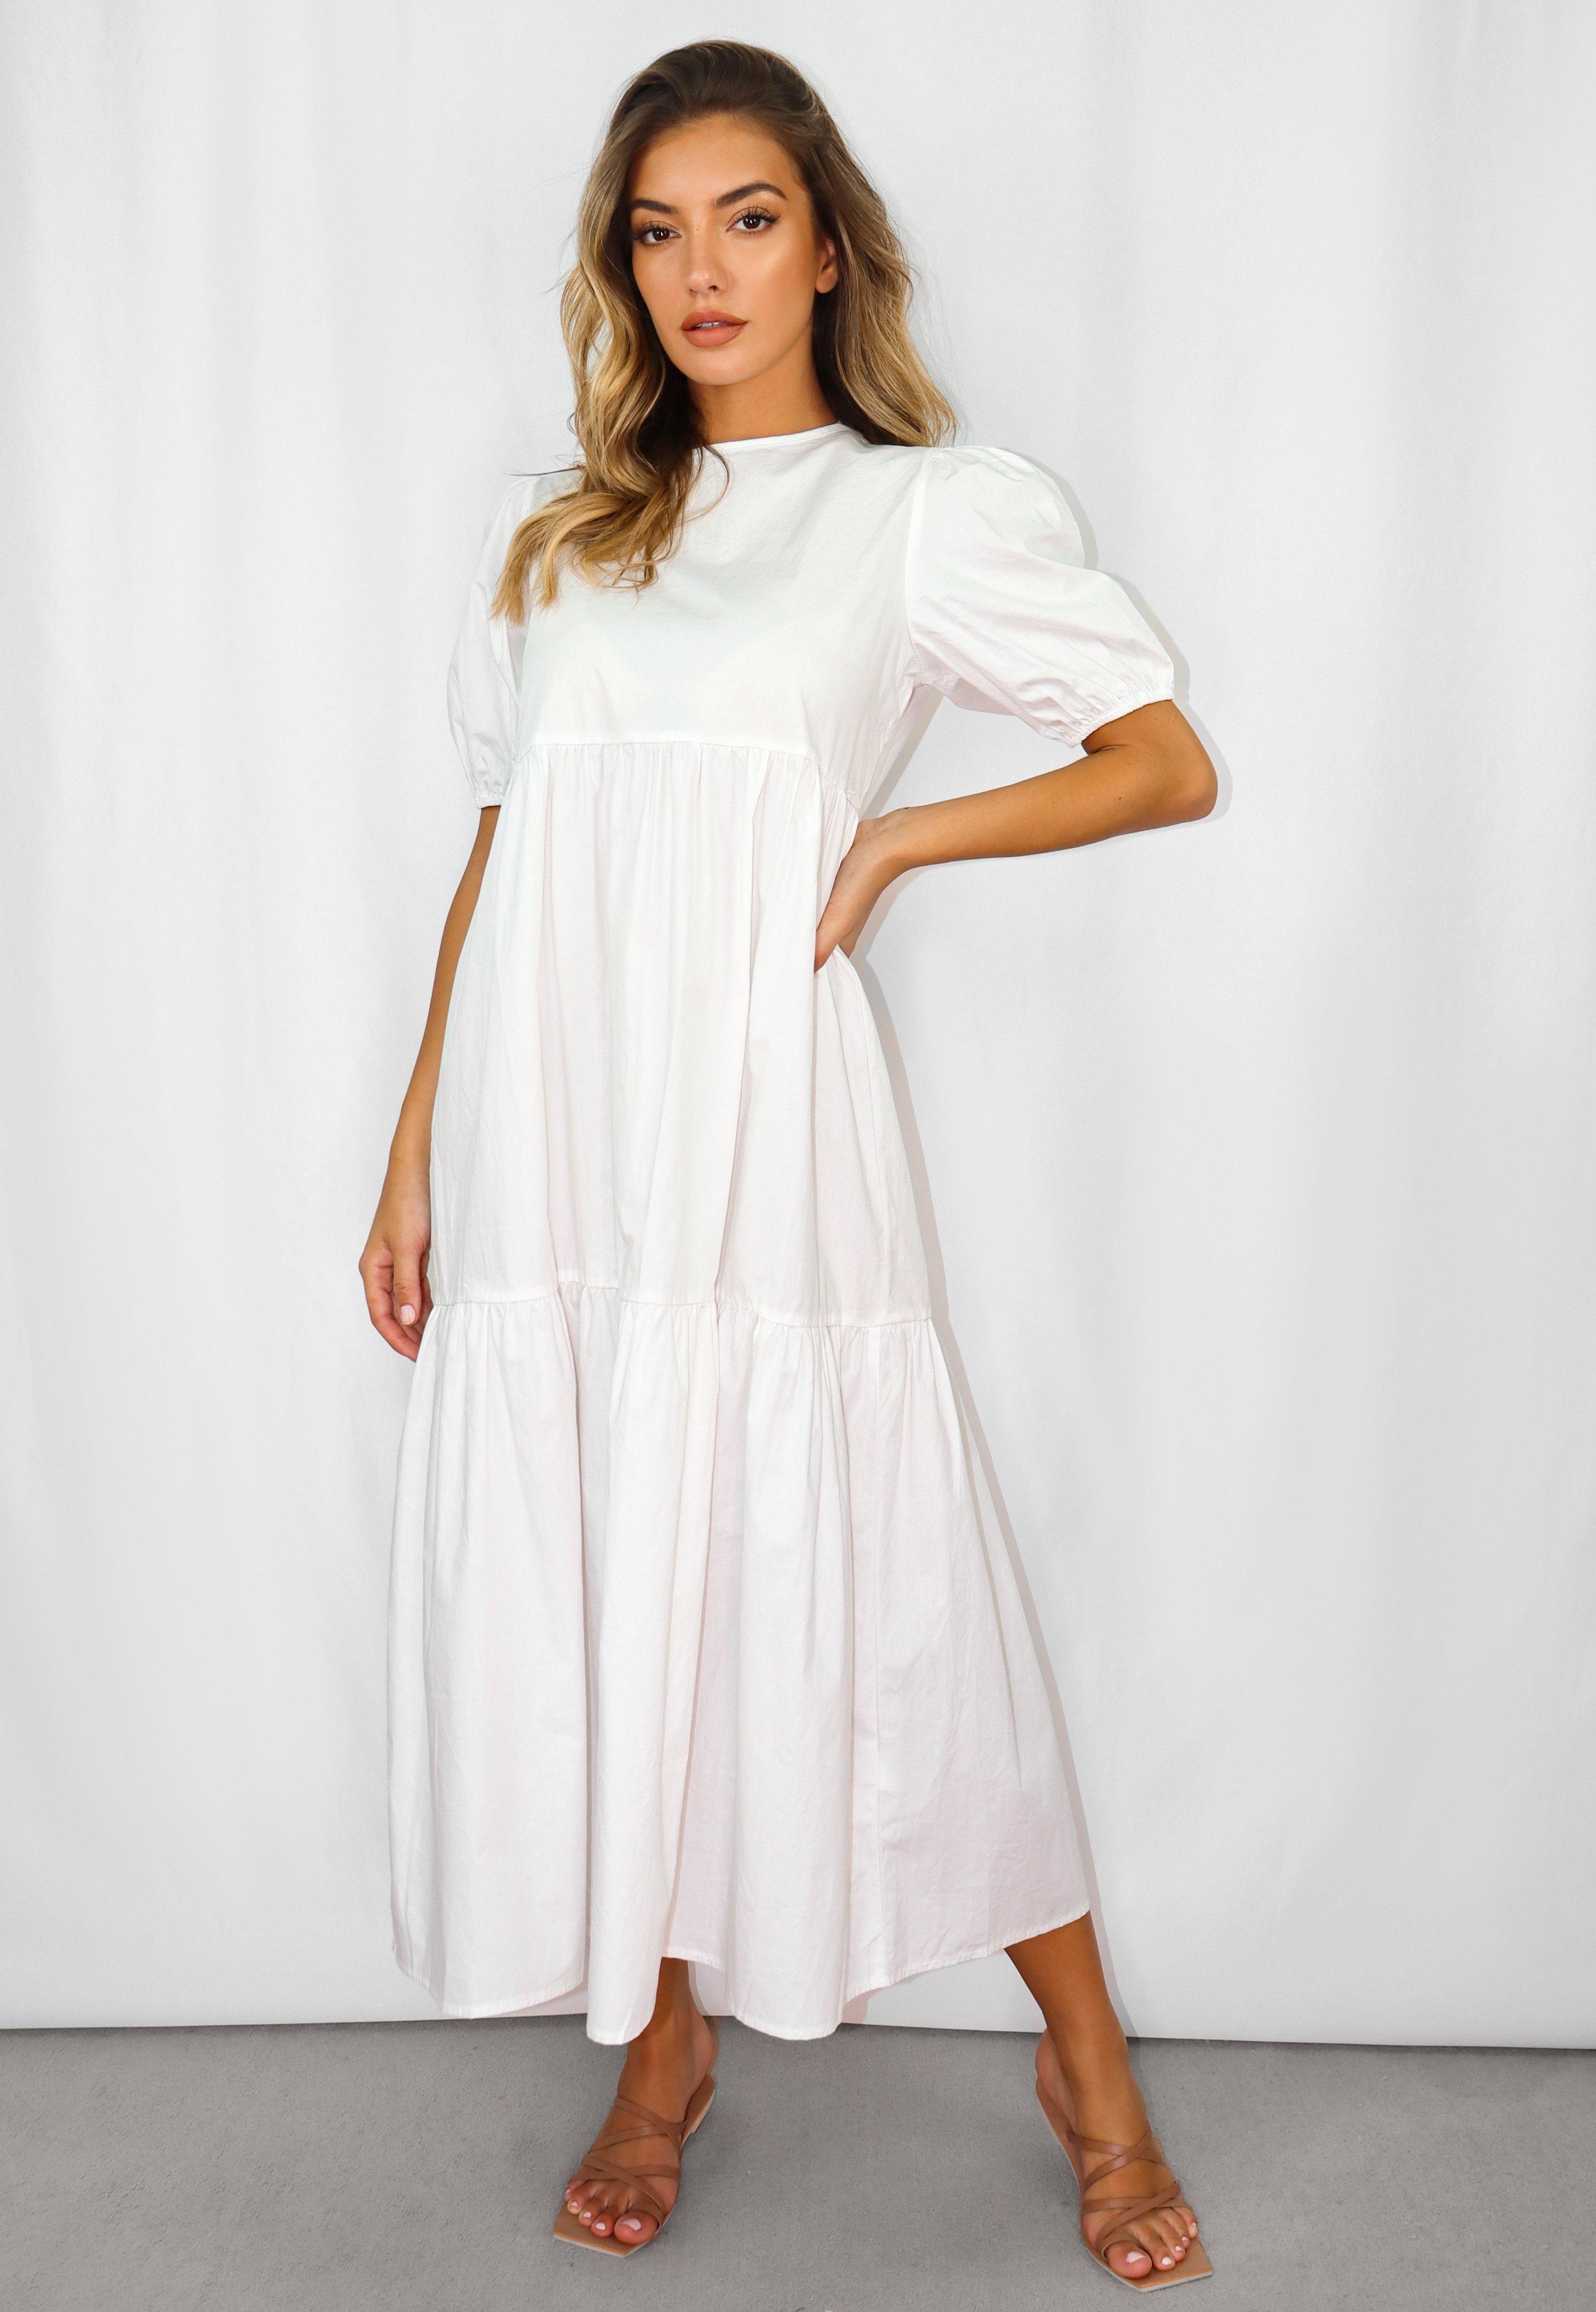 White Oversized Tiered Midi Smock Dress Sponsored Tiered Ad Oversized White Tiered Dress Casual Cotton Dress Summer Women Dress Online [ 4200 x 2900 Pixel ]